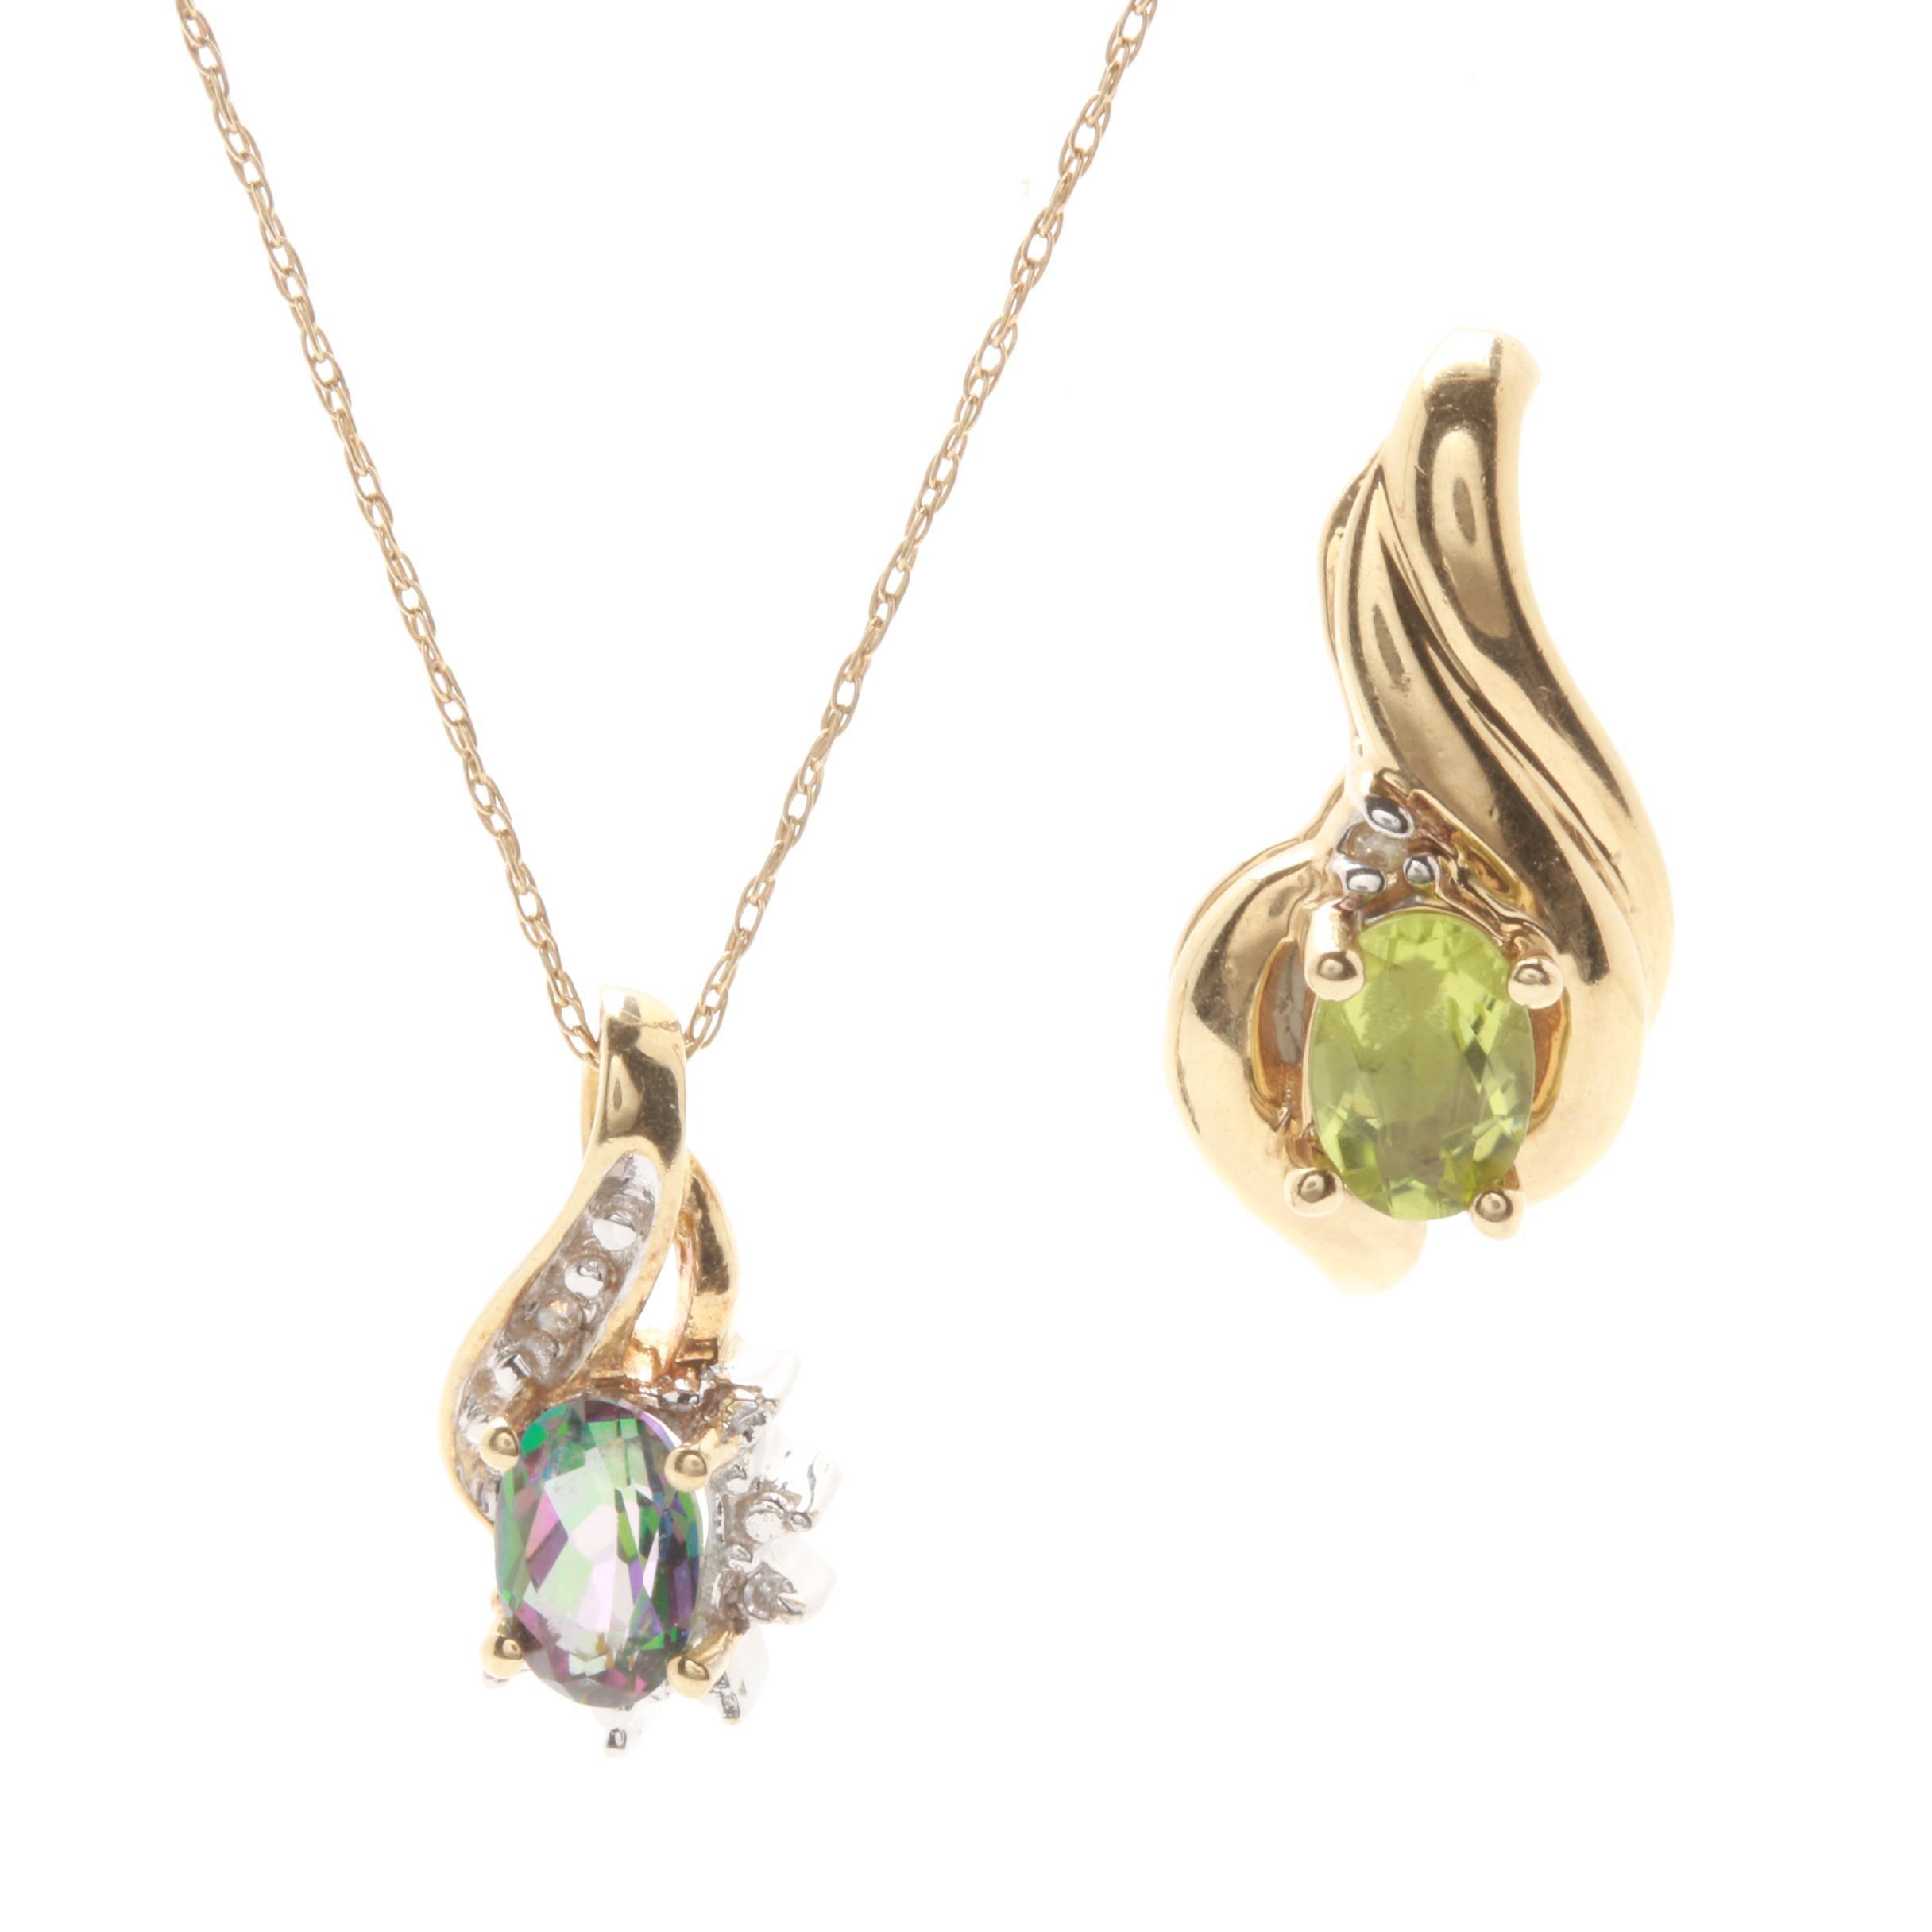 10K Yellow Gold Peridot, Diamond and Topaz Pendant and Necklace